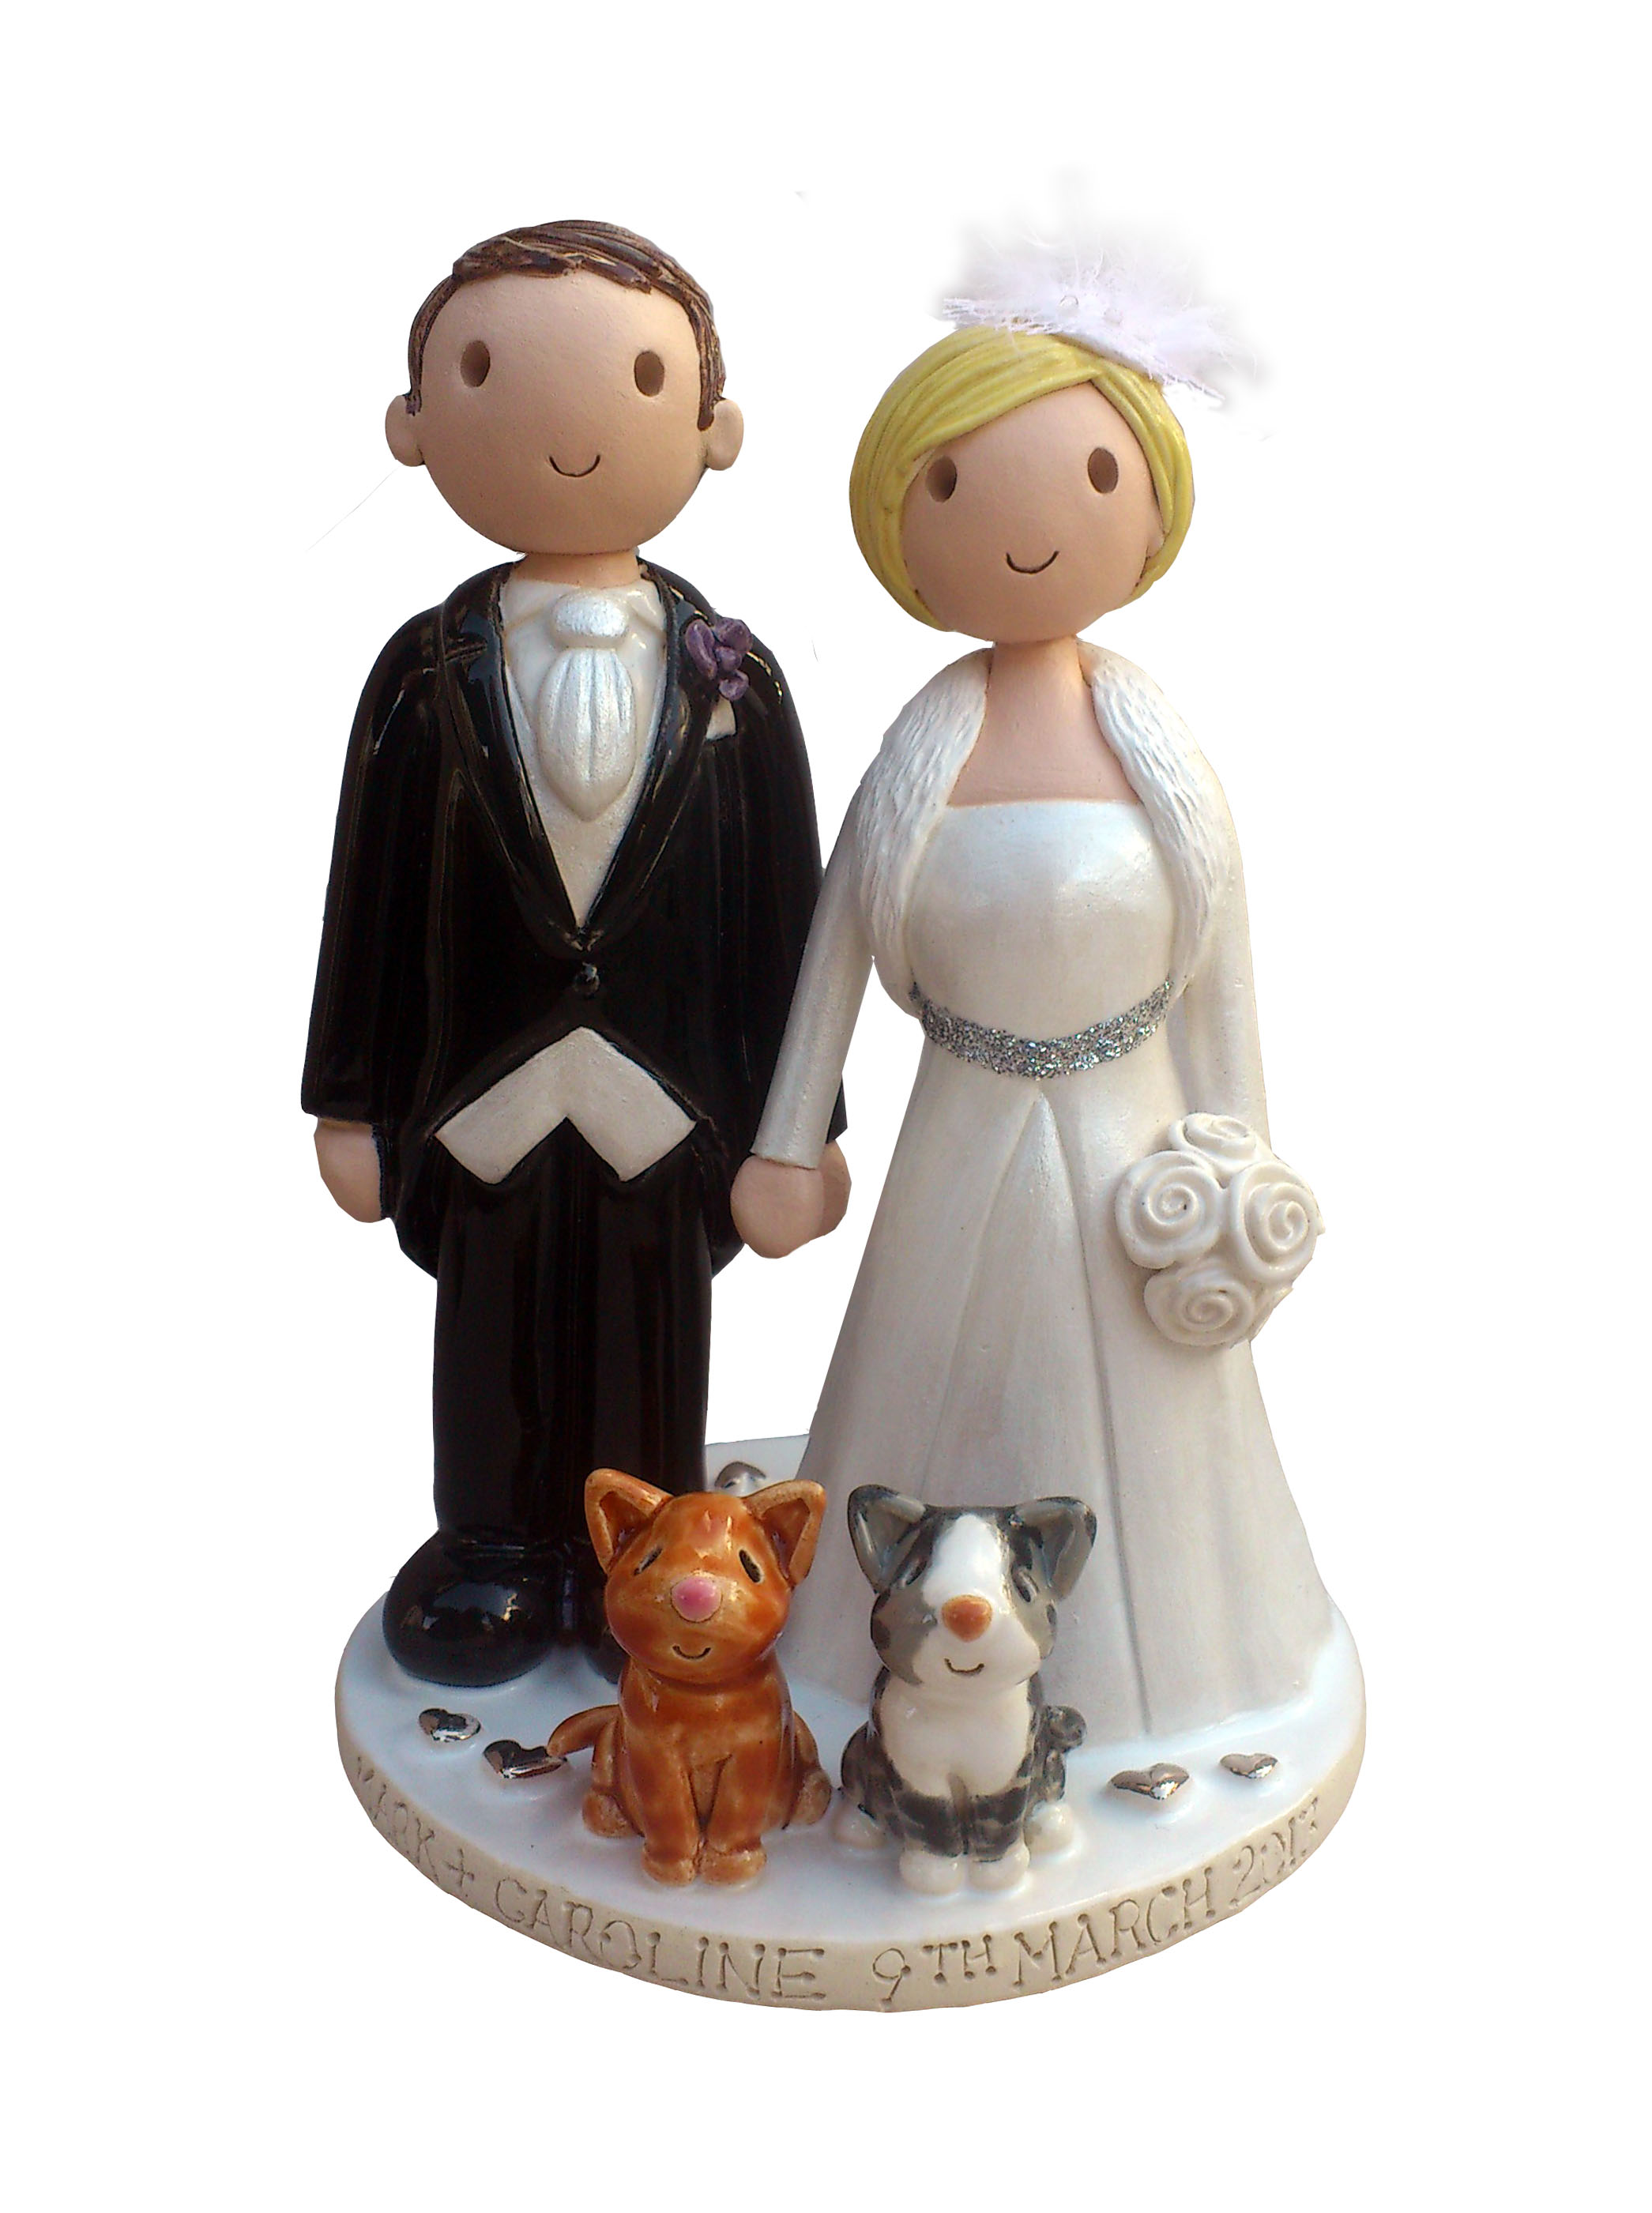 Wedding Cake Decorations Hobbycraft : Cake Delivery Personalised Cupcakes Photo Cakes Edible ...